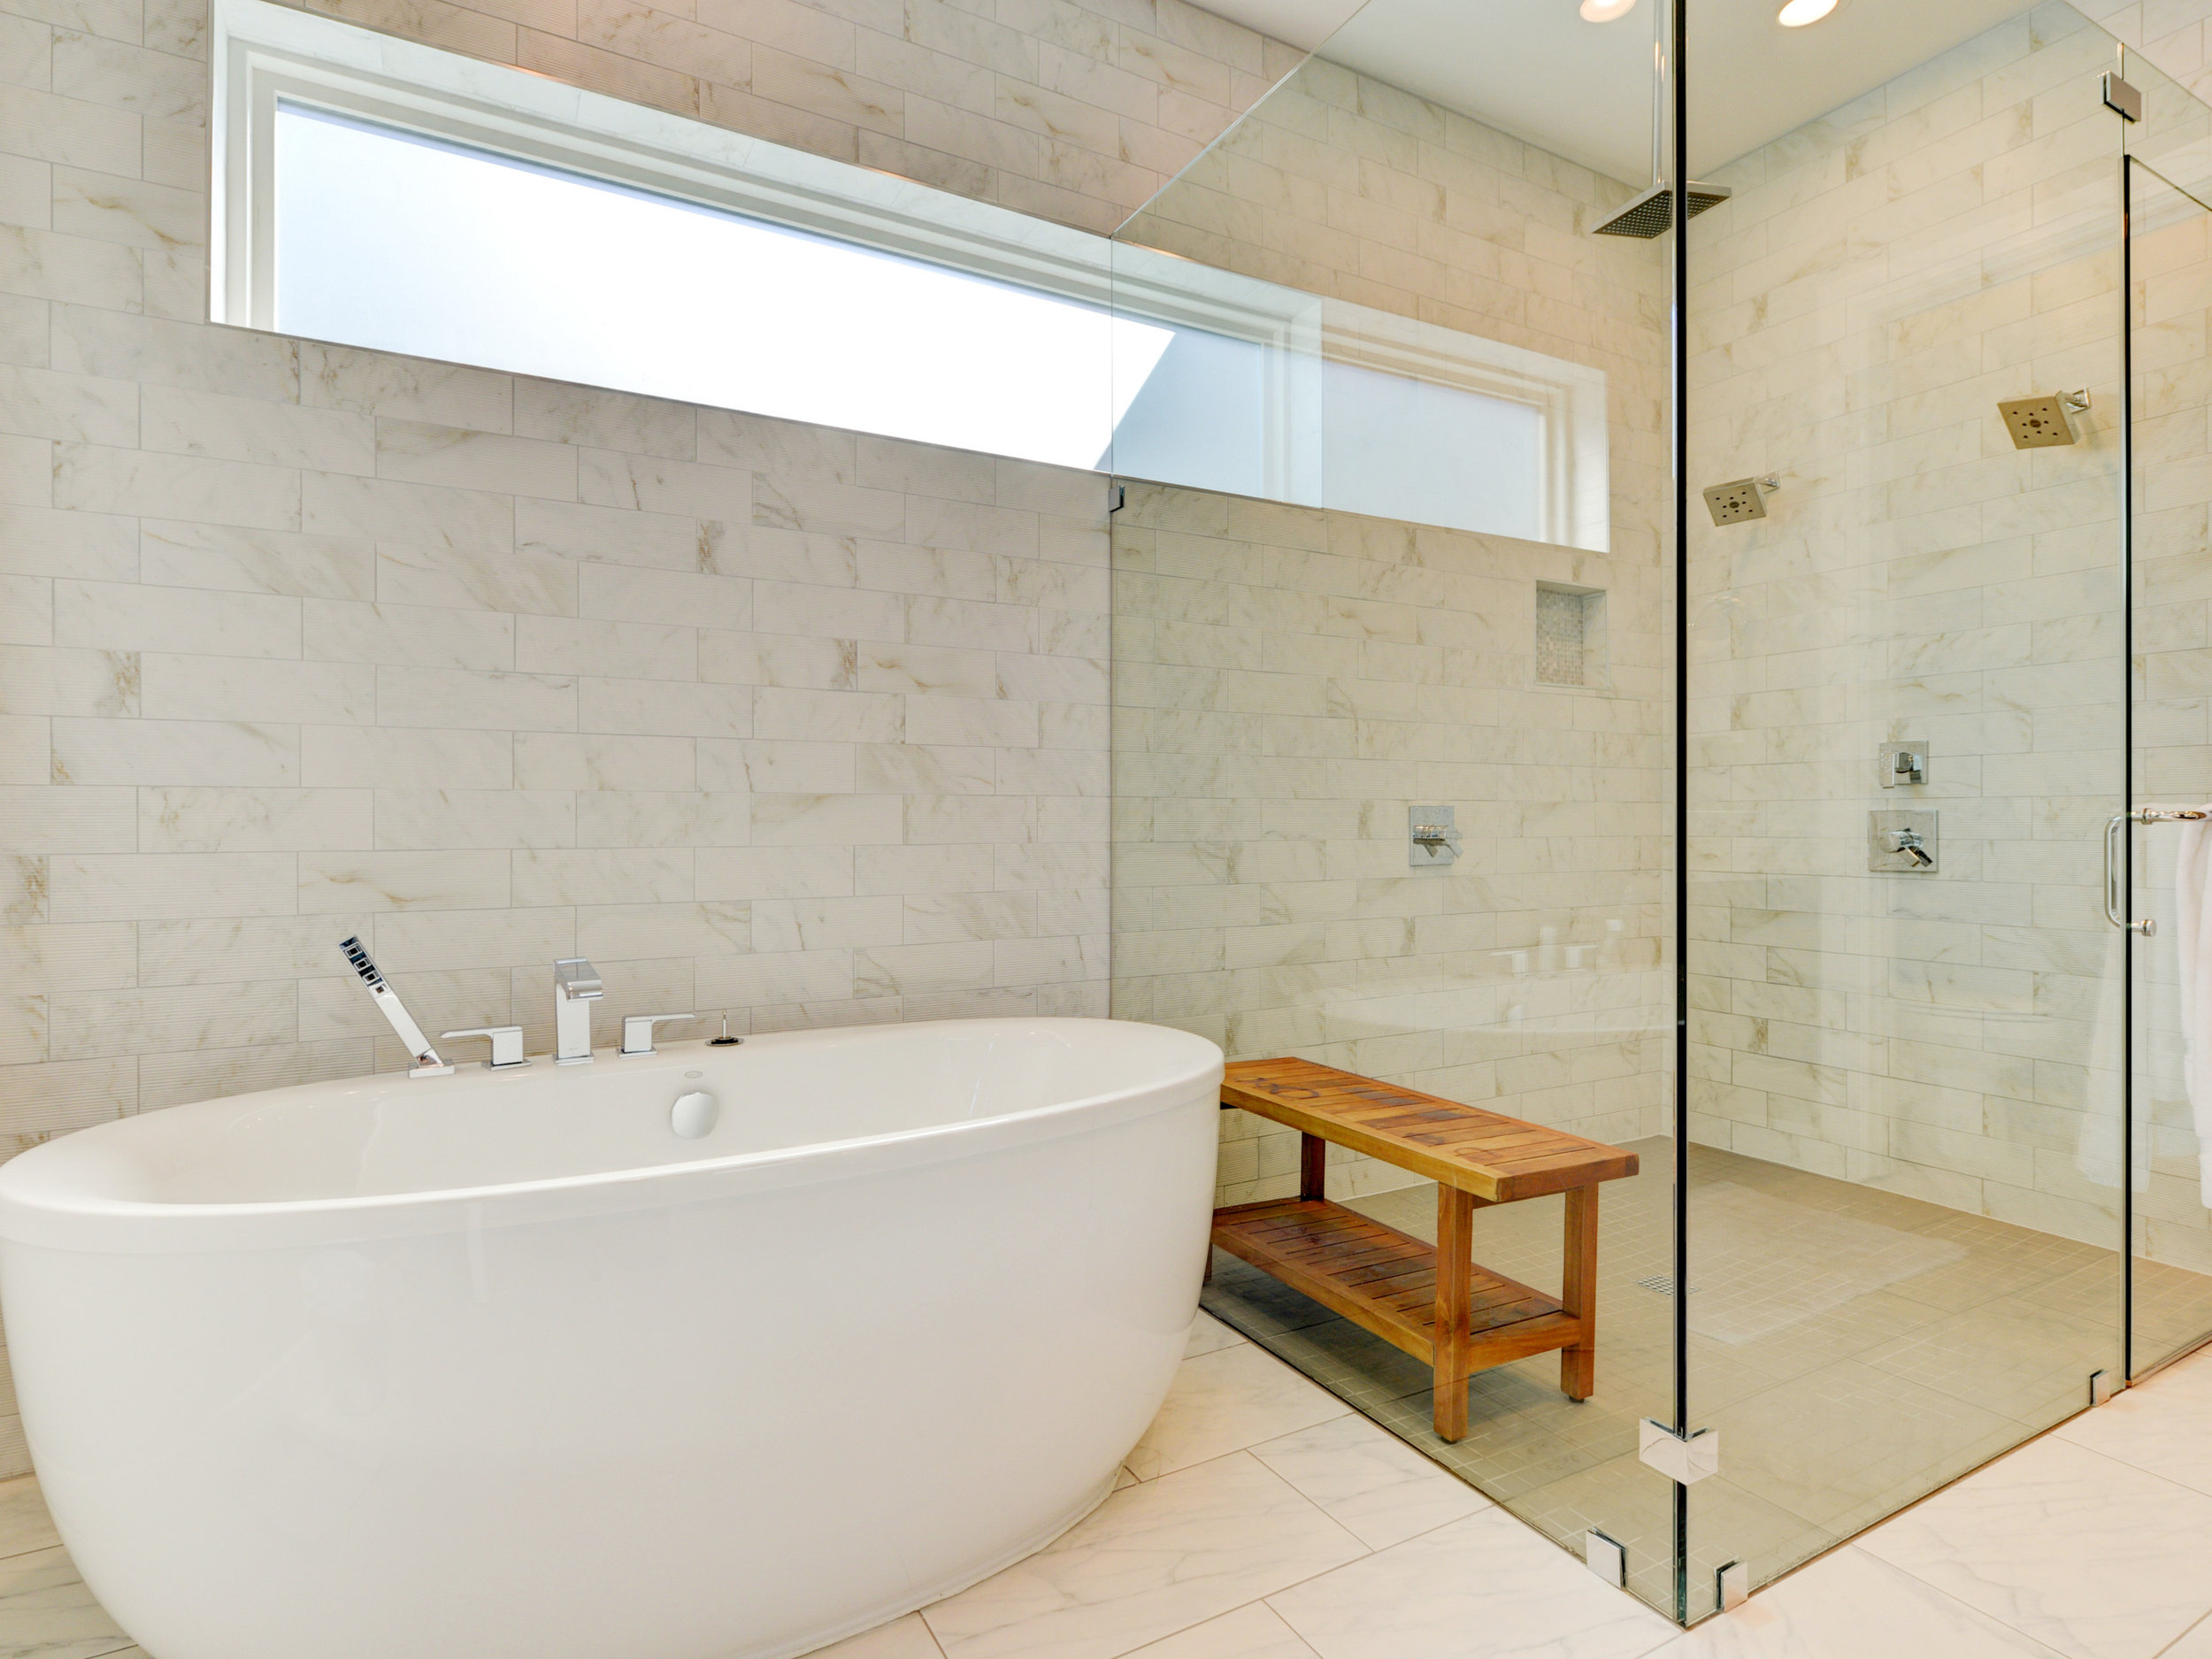 020_Master Bathroom 2.jpg